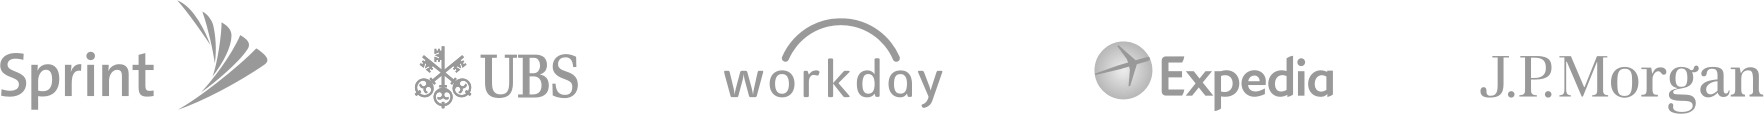 Логотипы Sprint, UBS, Workday, Expedia и J.P. Morgan